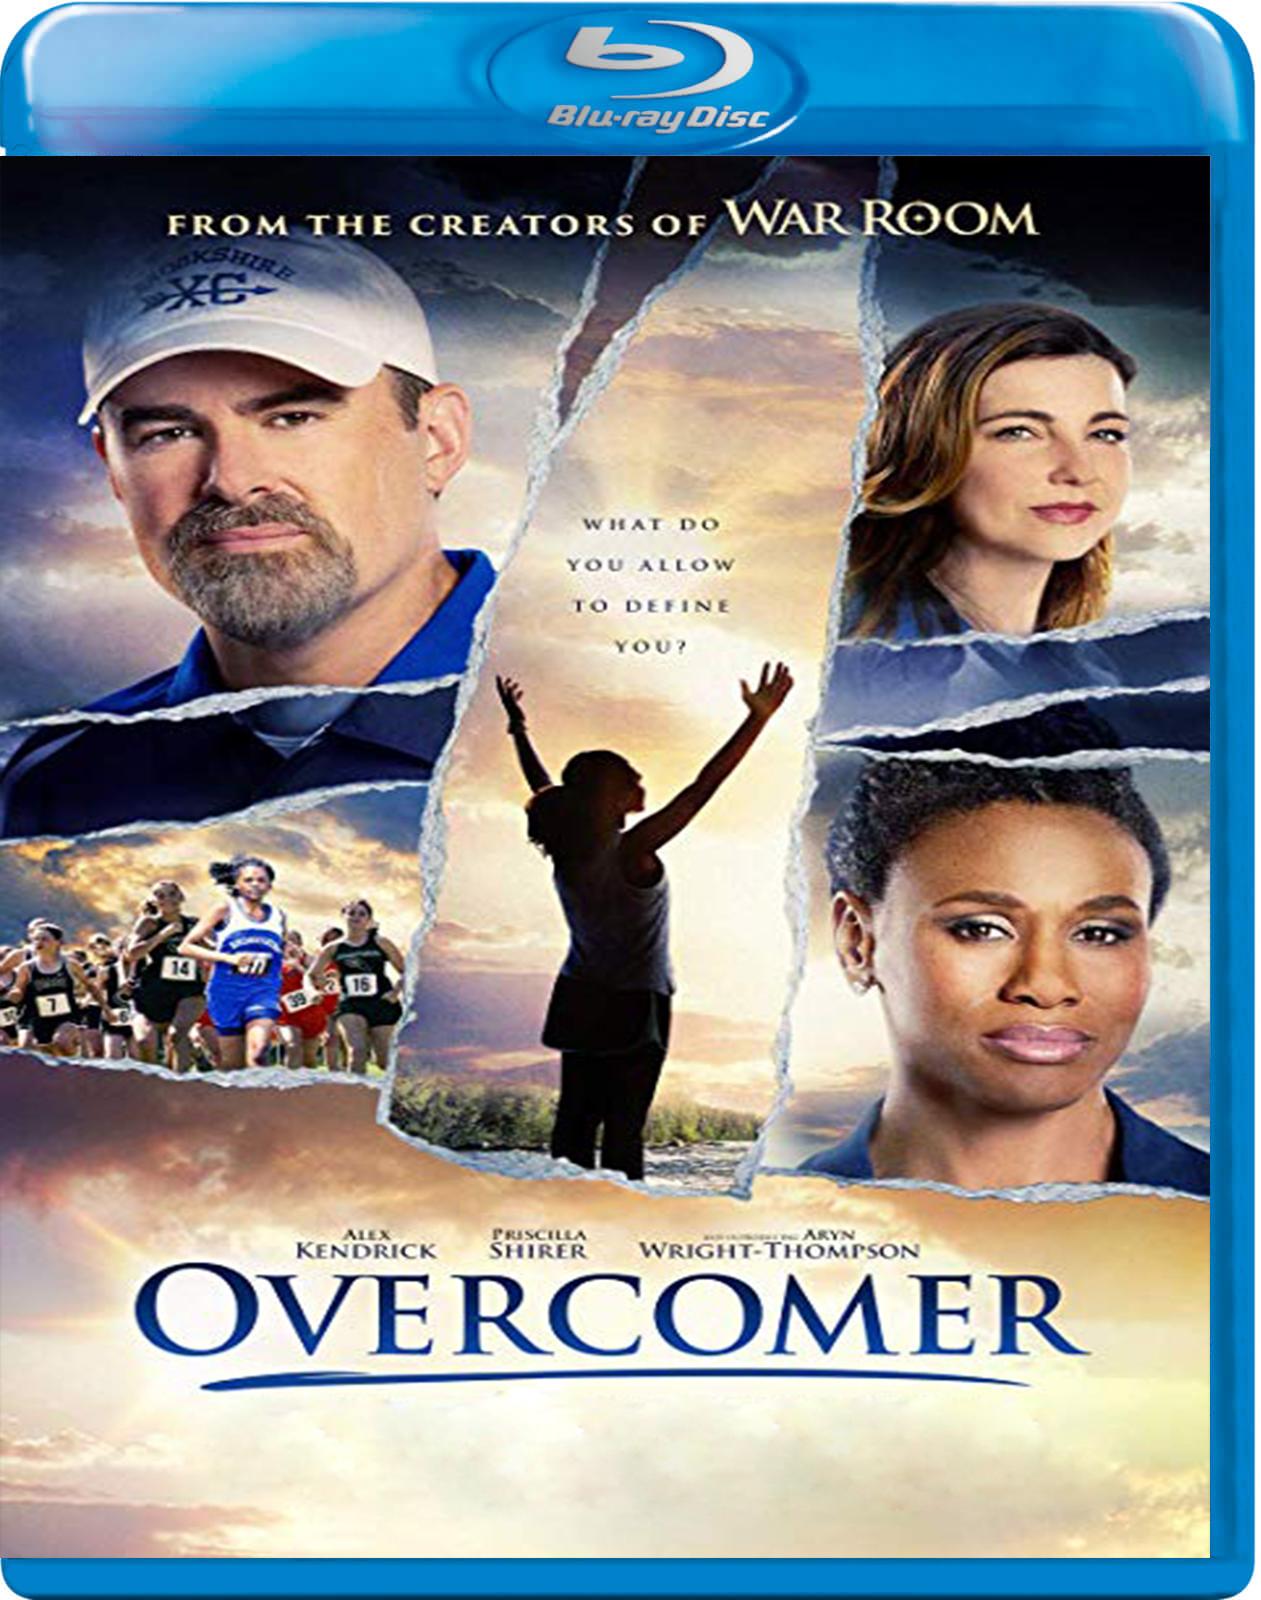 Overcomer [2019] [BD50] [Latino]